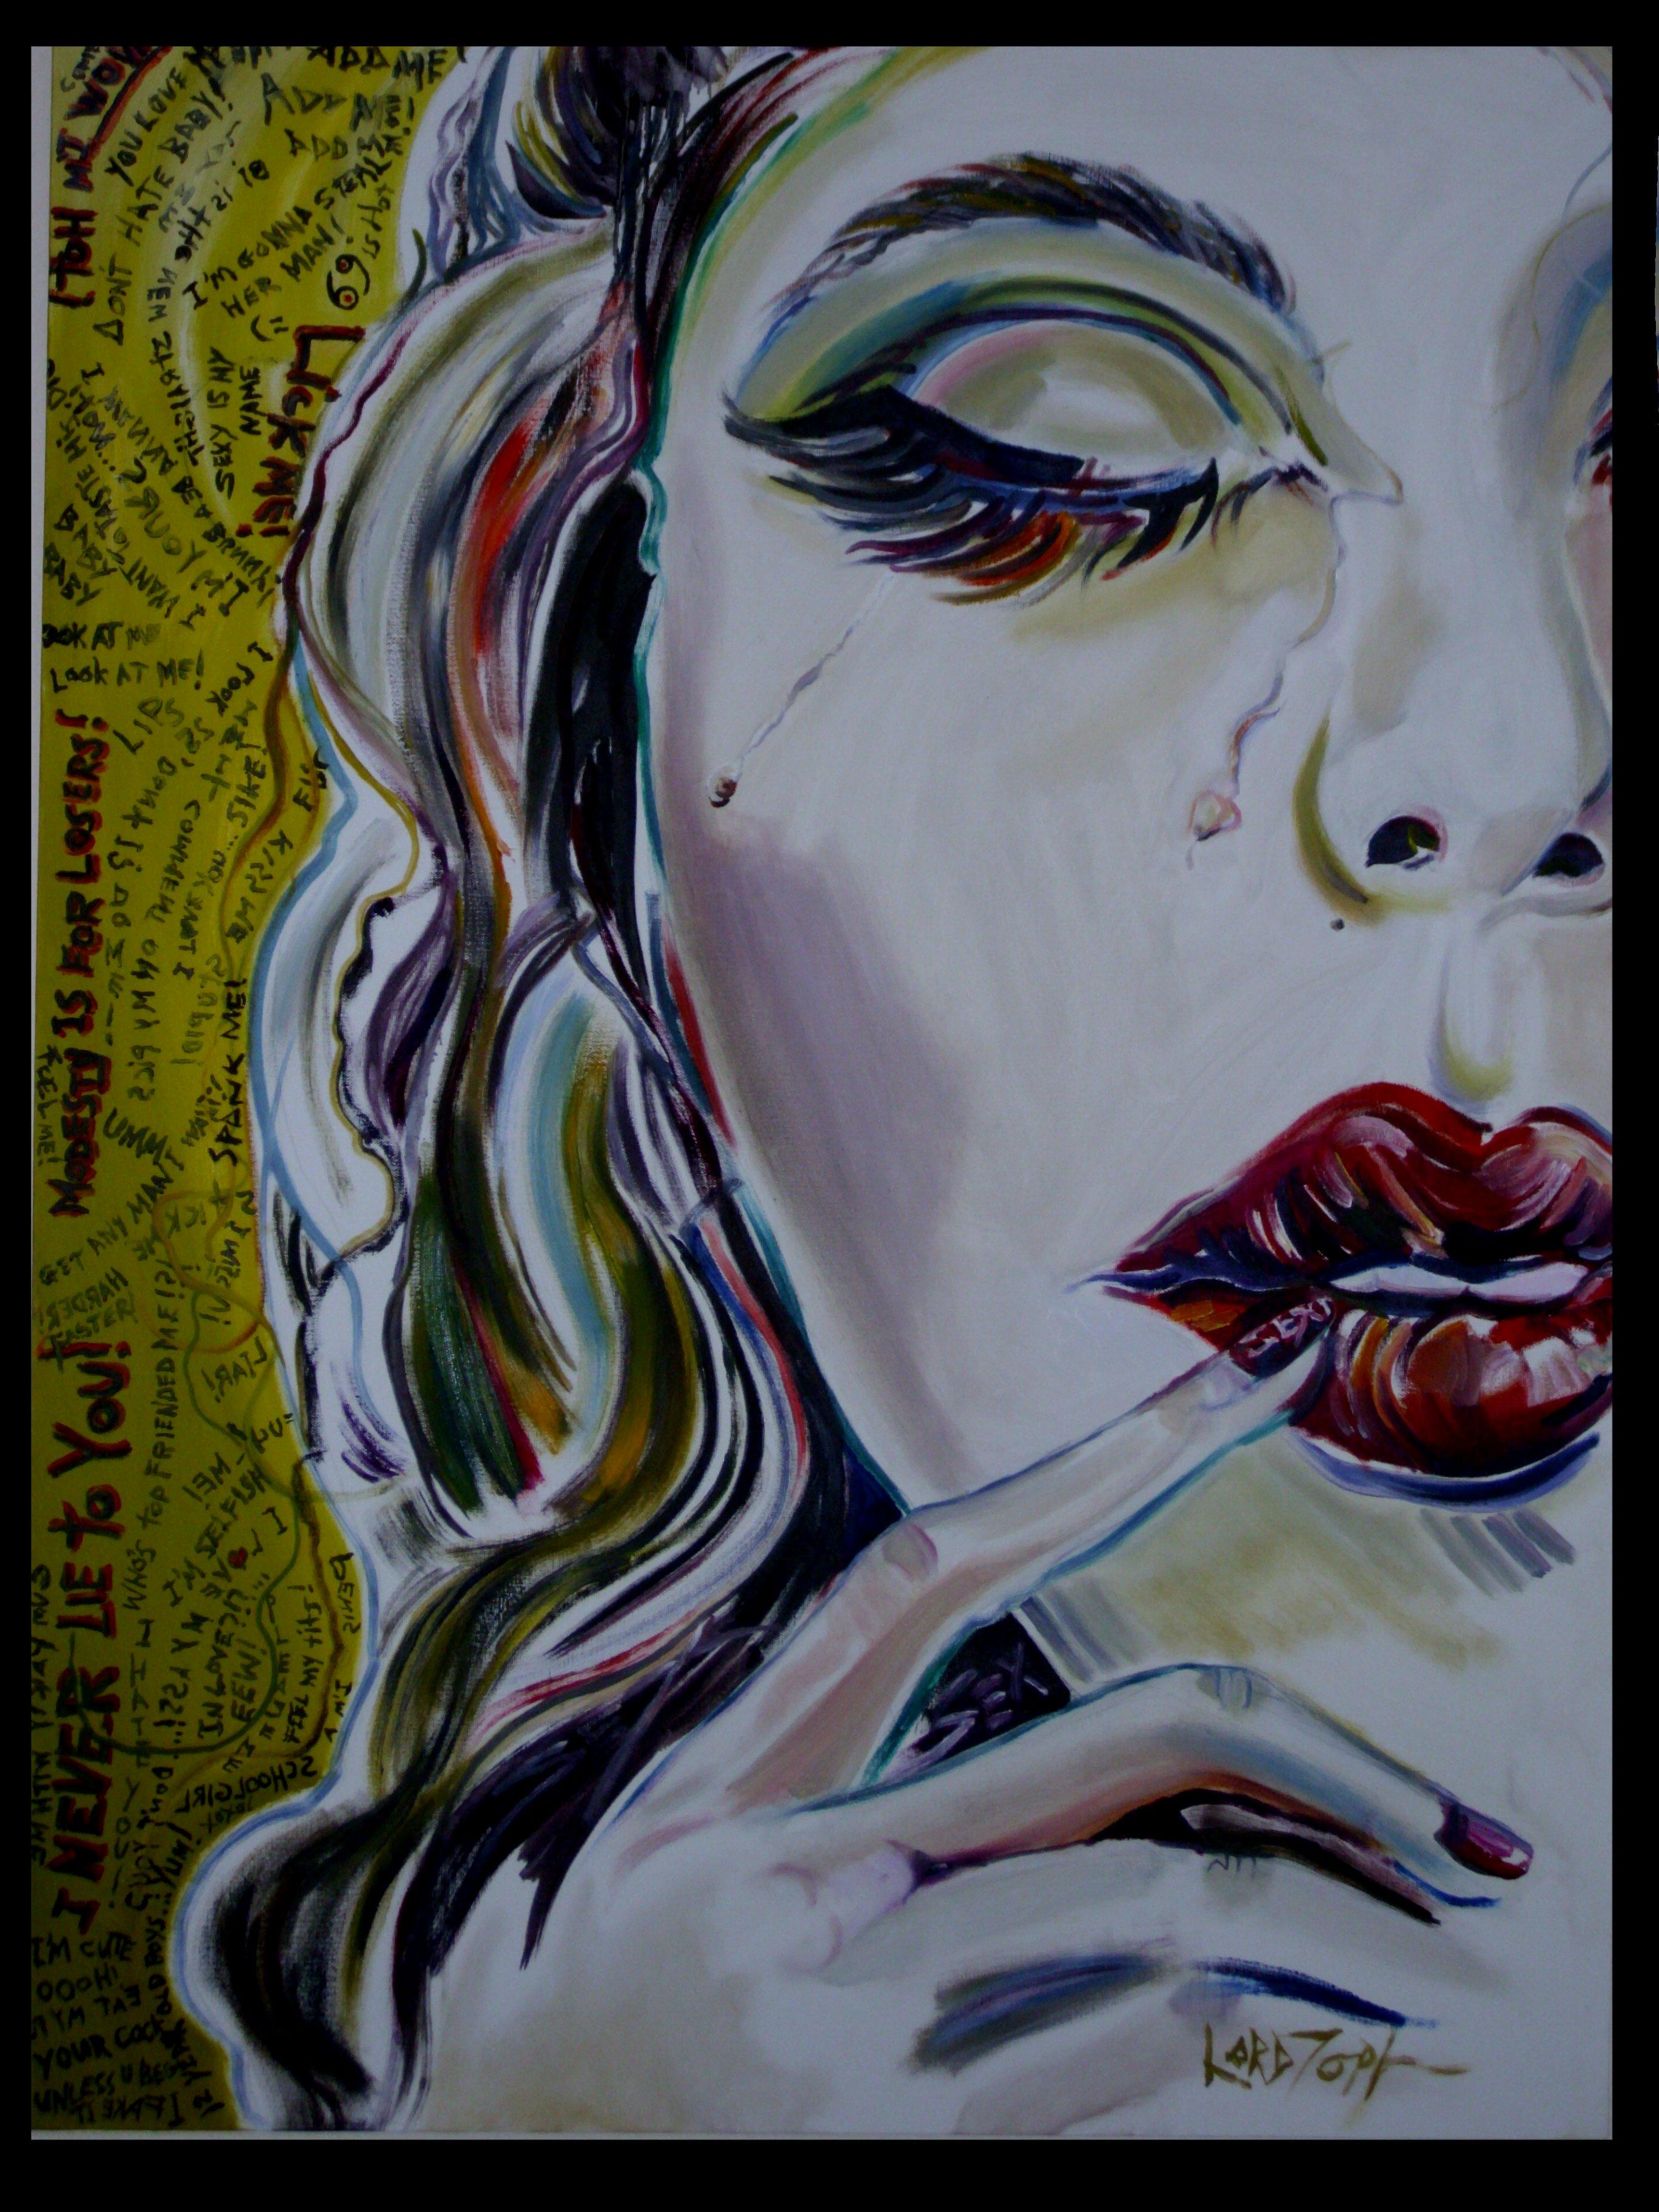 Delilah's Lust for Vanity (Oil on Canvas)